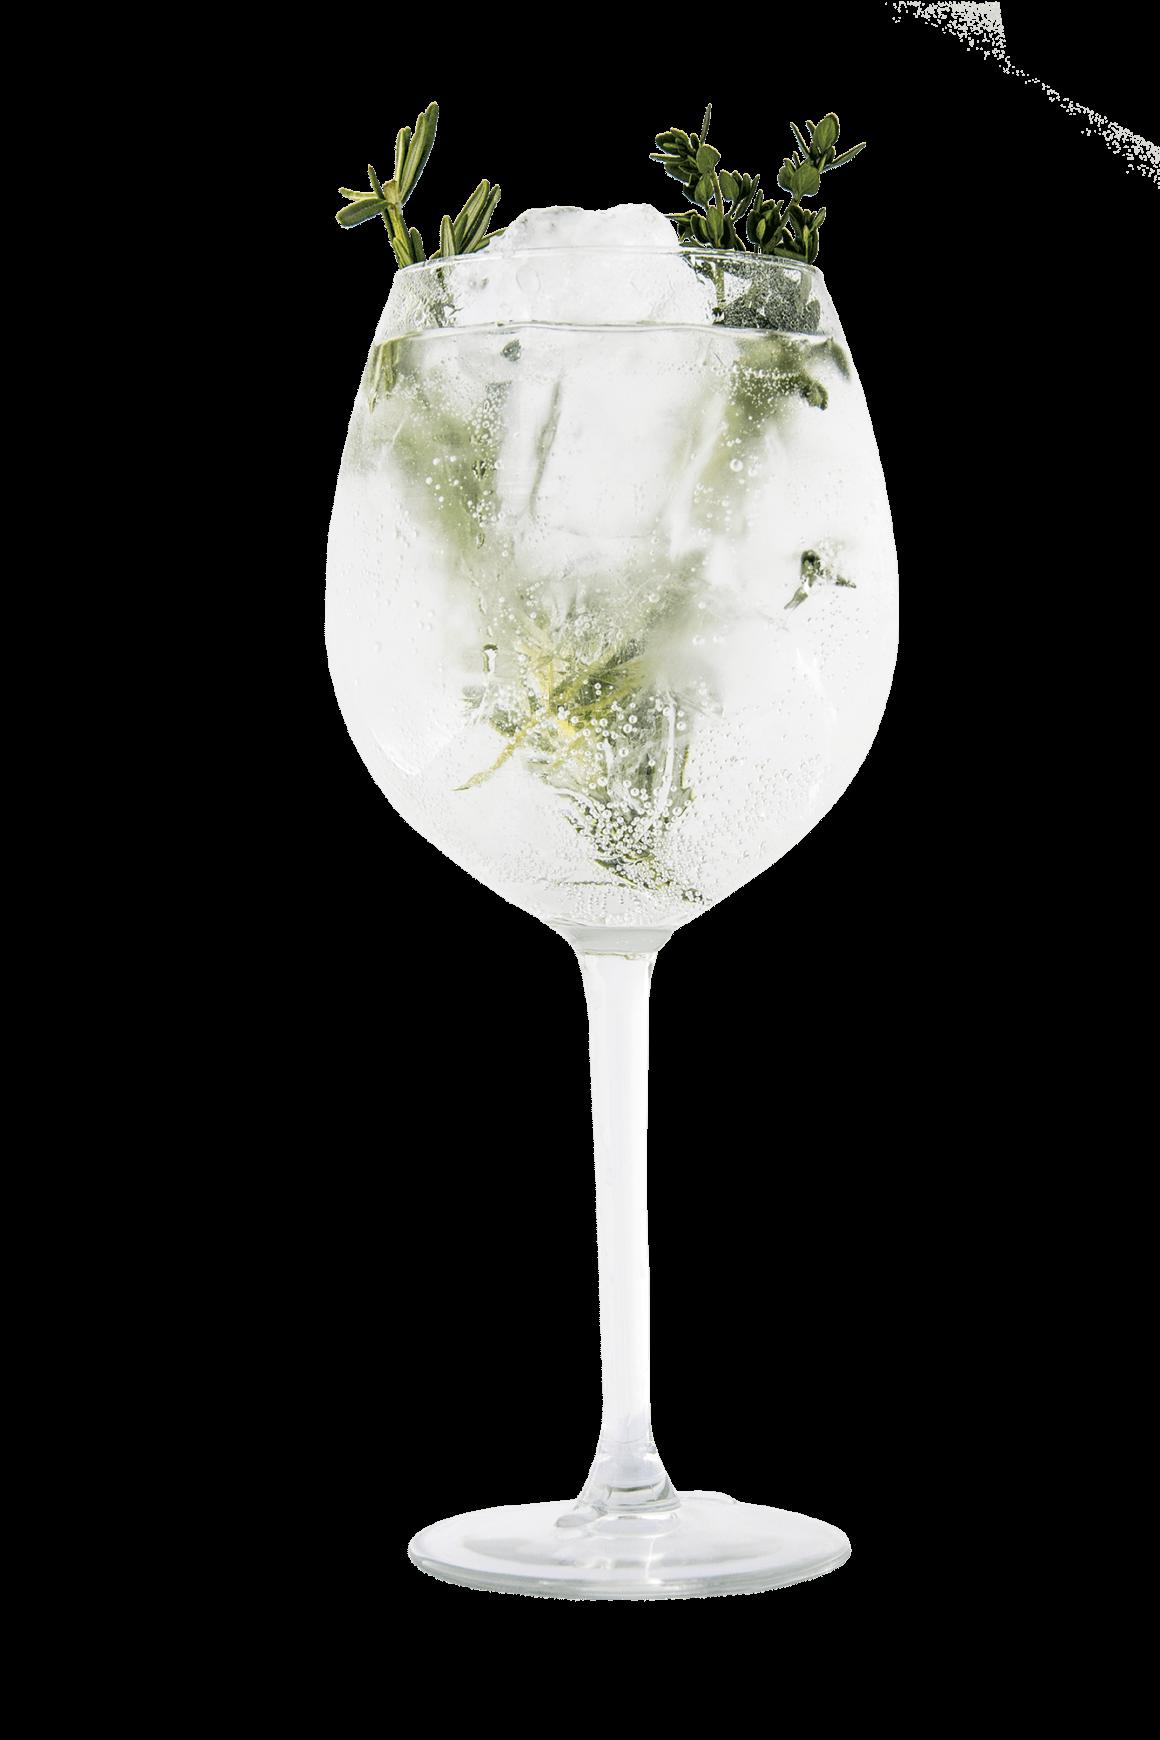 mediterranean gin tonic